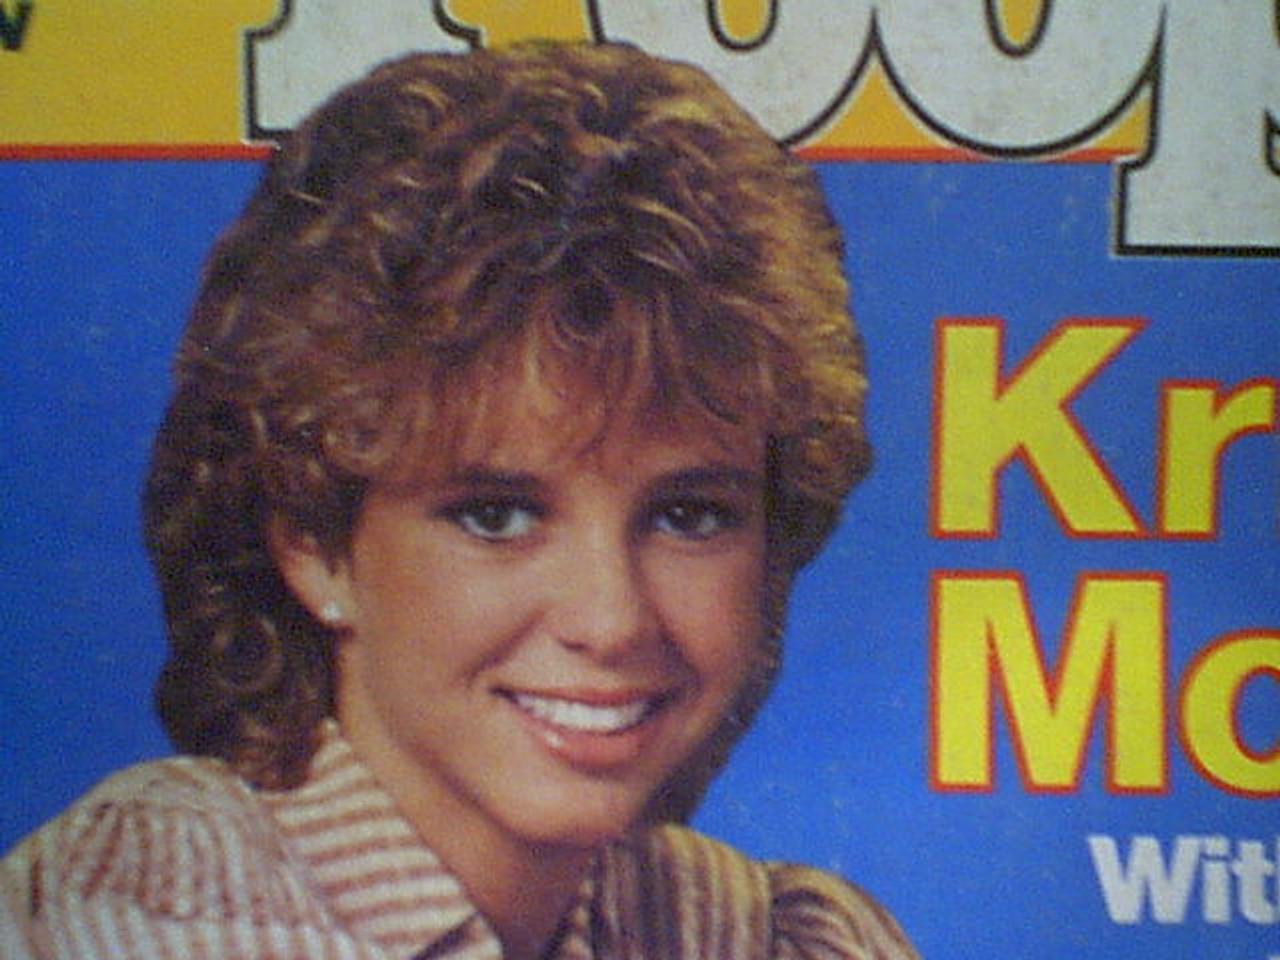 McNichol, Kristy People Magazine 1983 Signed Autograph Color Cover Photo